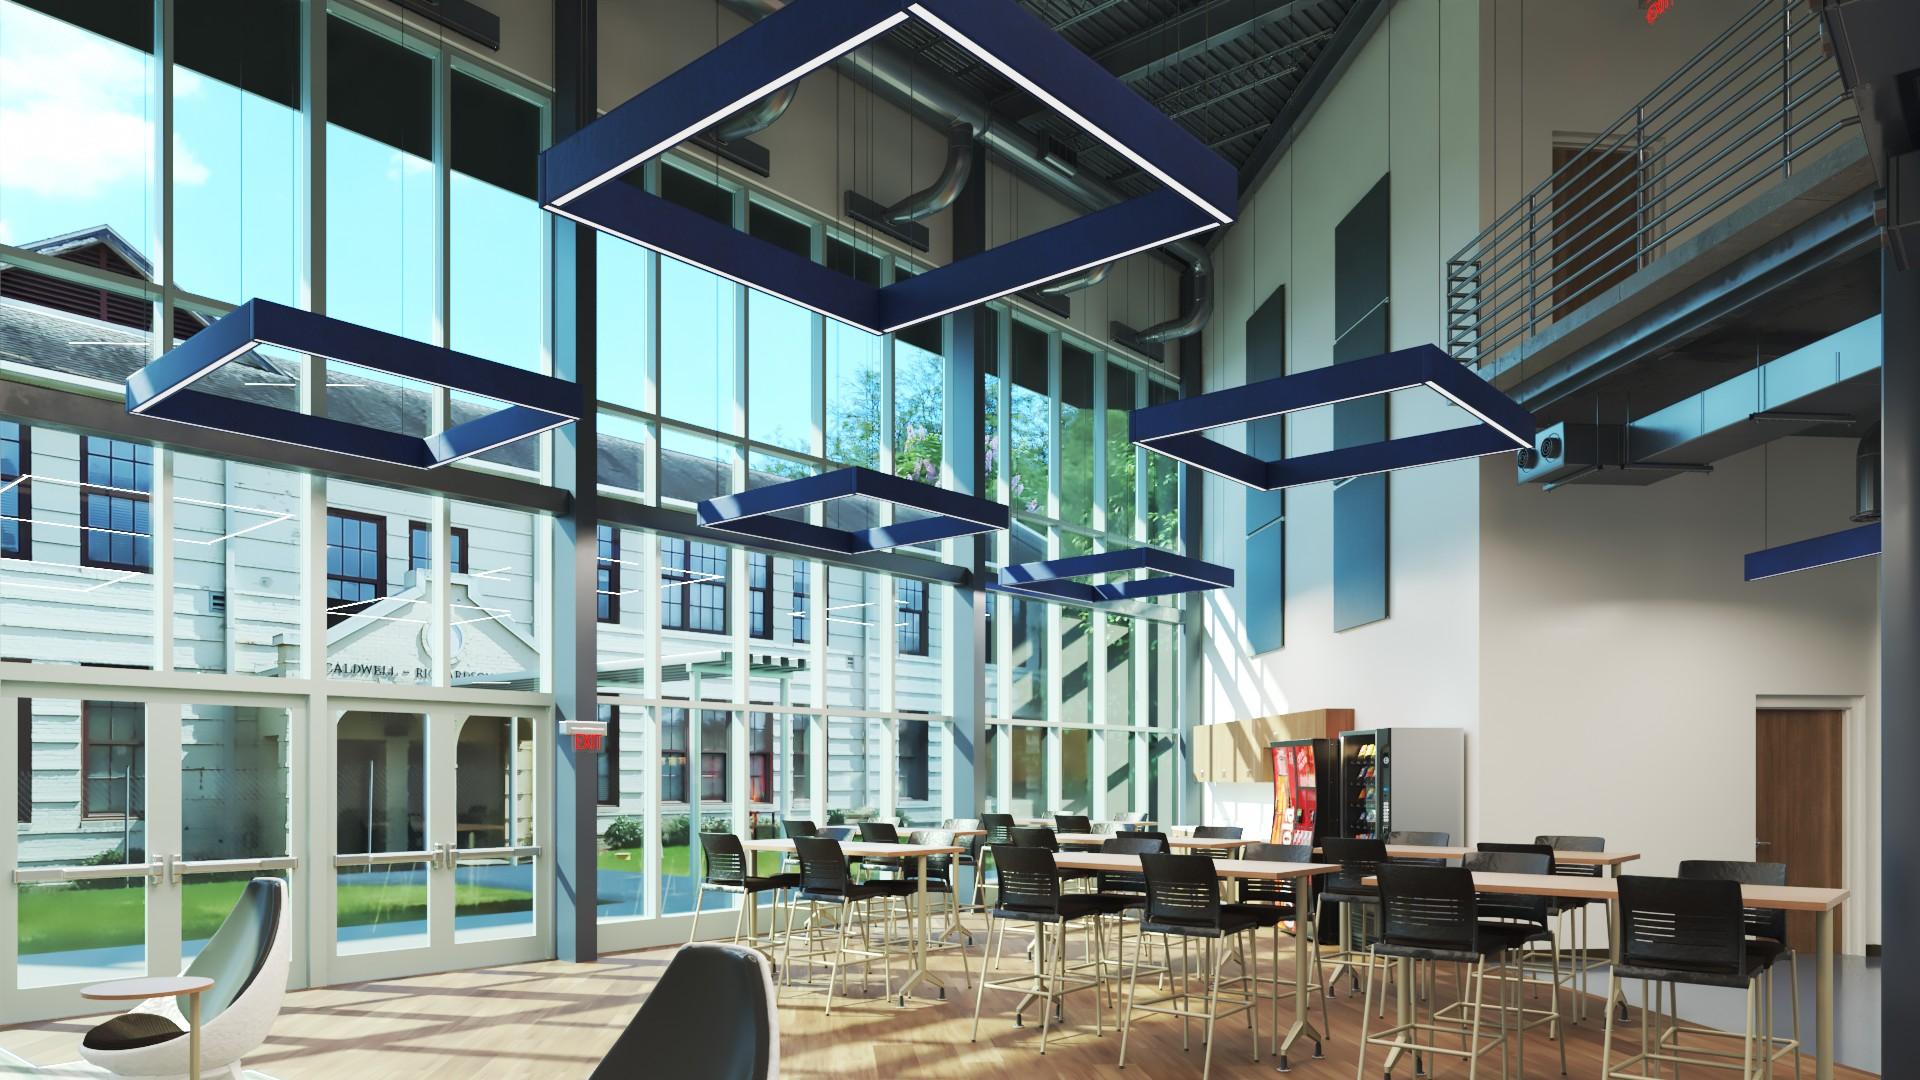 Cyber Cafe - Advanced Manufacturing Center- Bishop State Community College - Bishop State Foundation - Mobile AL